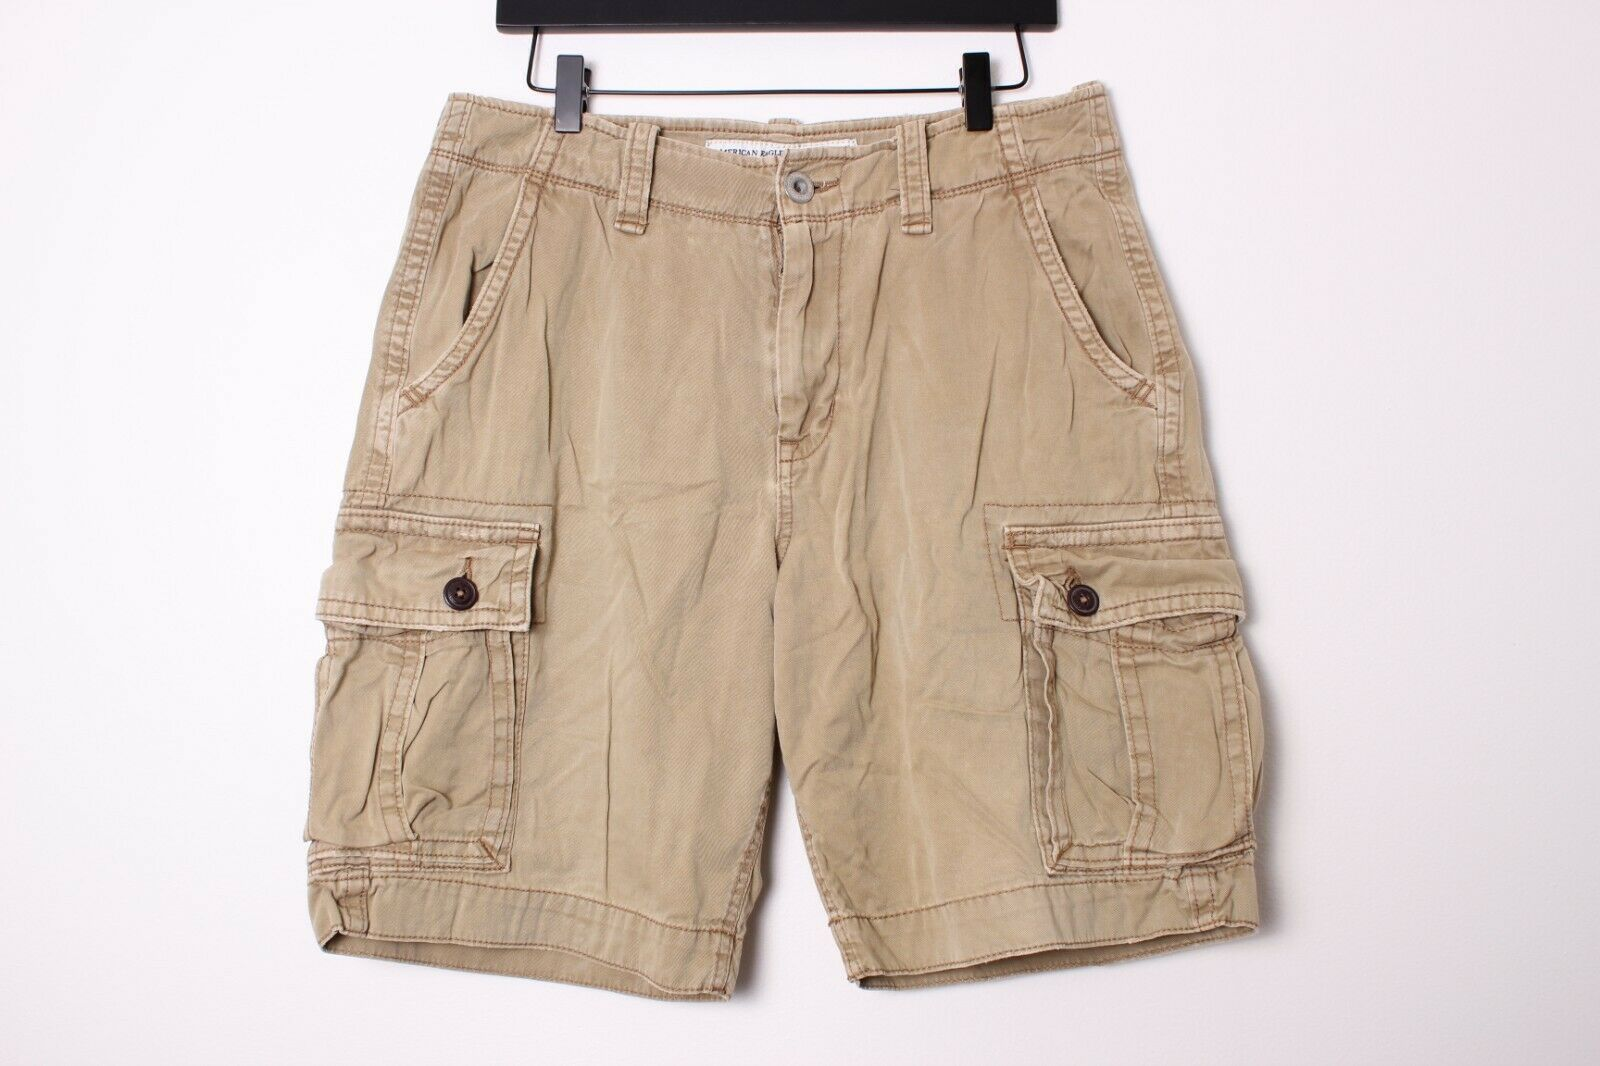 American Eagle Classic Fit Tan Khaki Cargo Shorts - 32